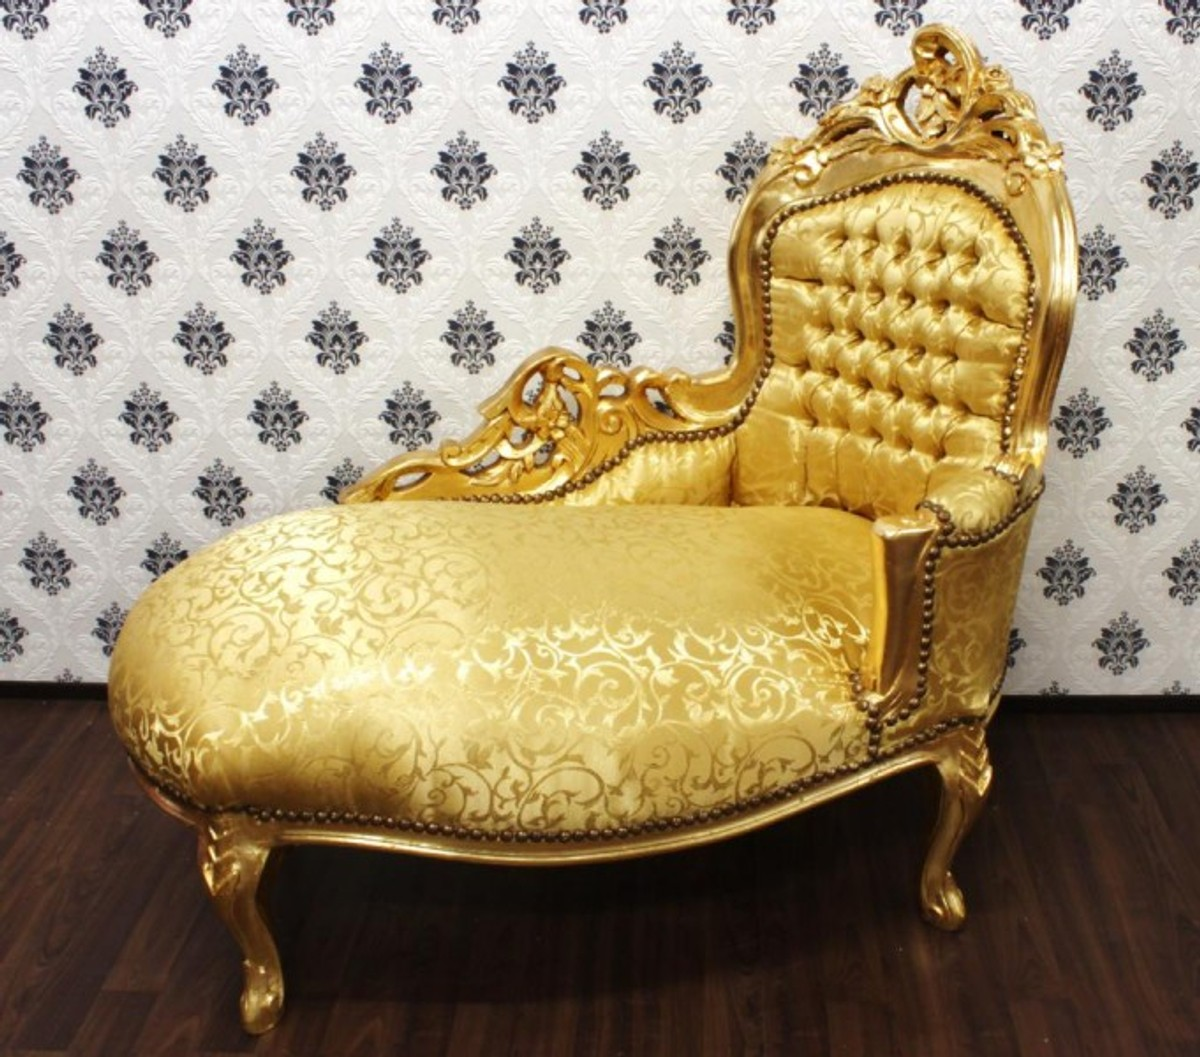 Full Size of Recamiere Barock Boudoir Rot Chaiselongue Diplomatie Casa Padrino Gold Muster Bett Sofa Mit Wohnzimmer Recamiere Barock